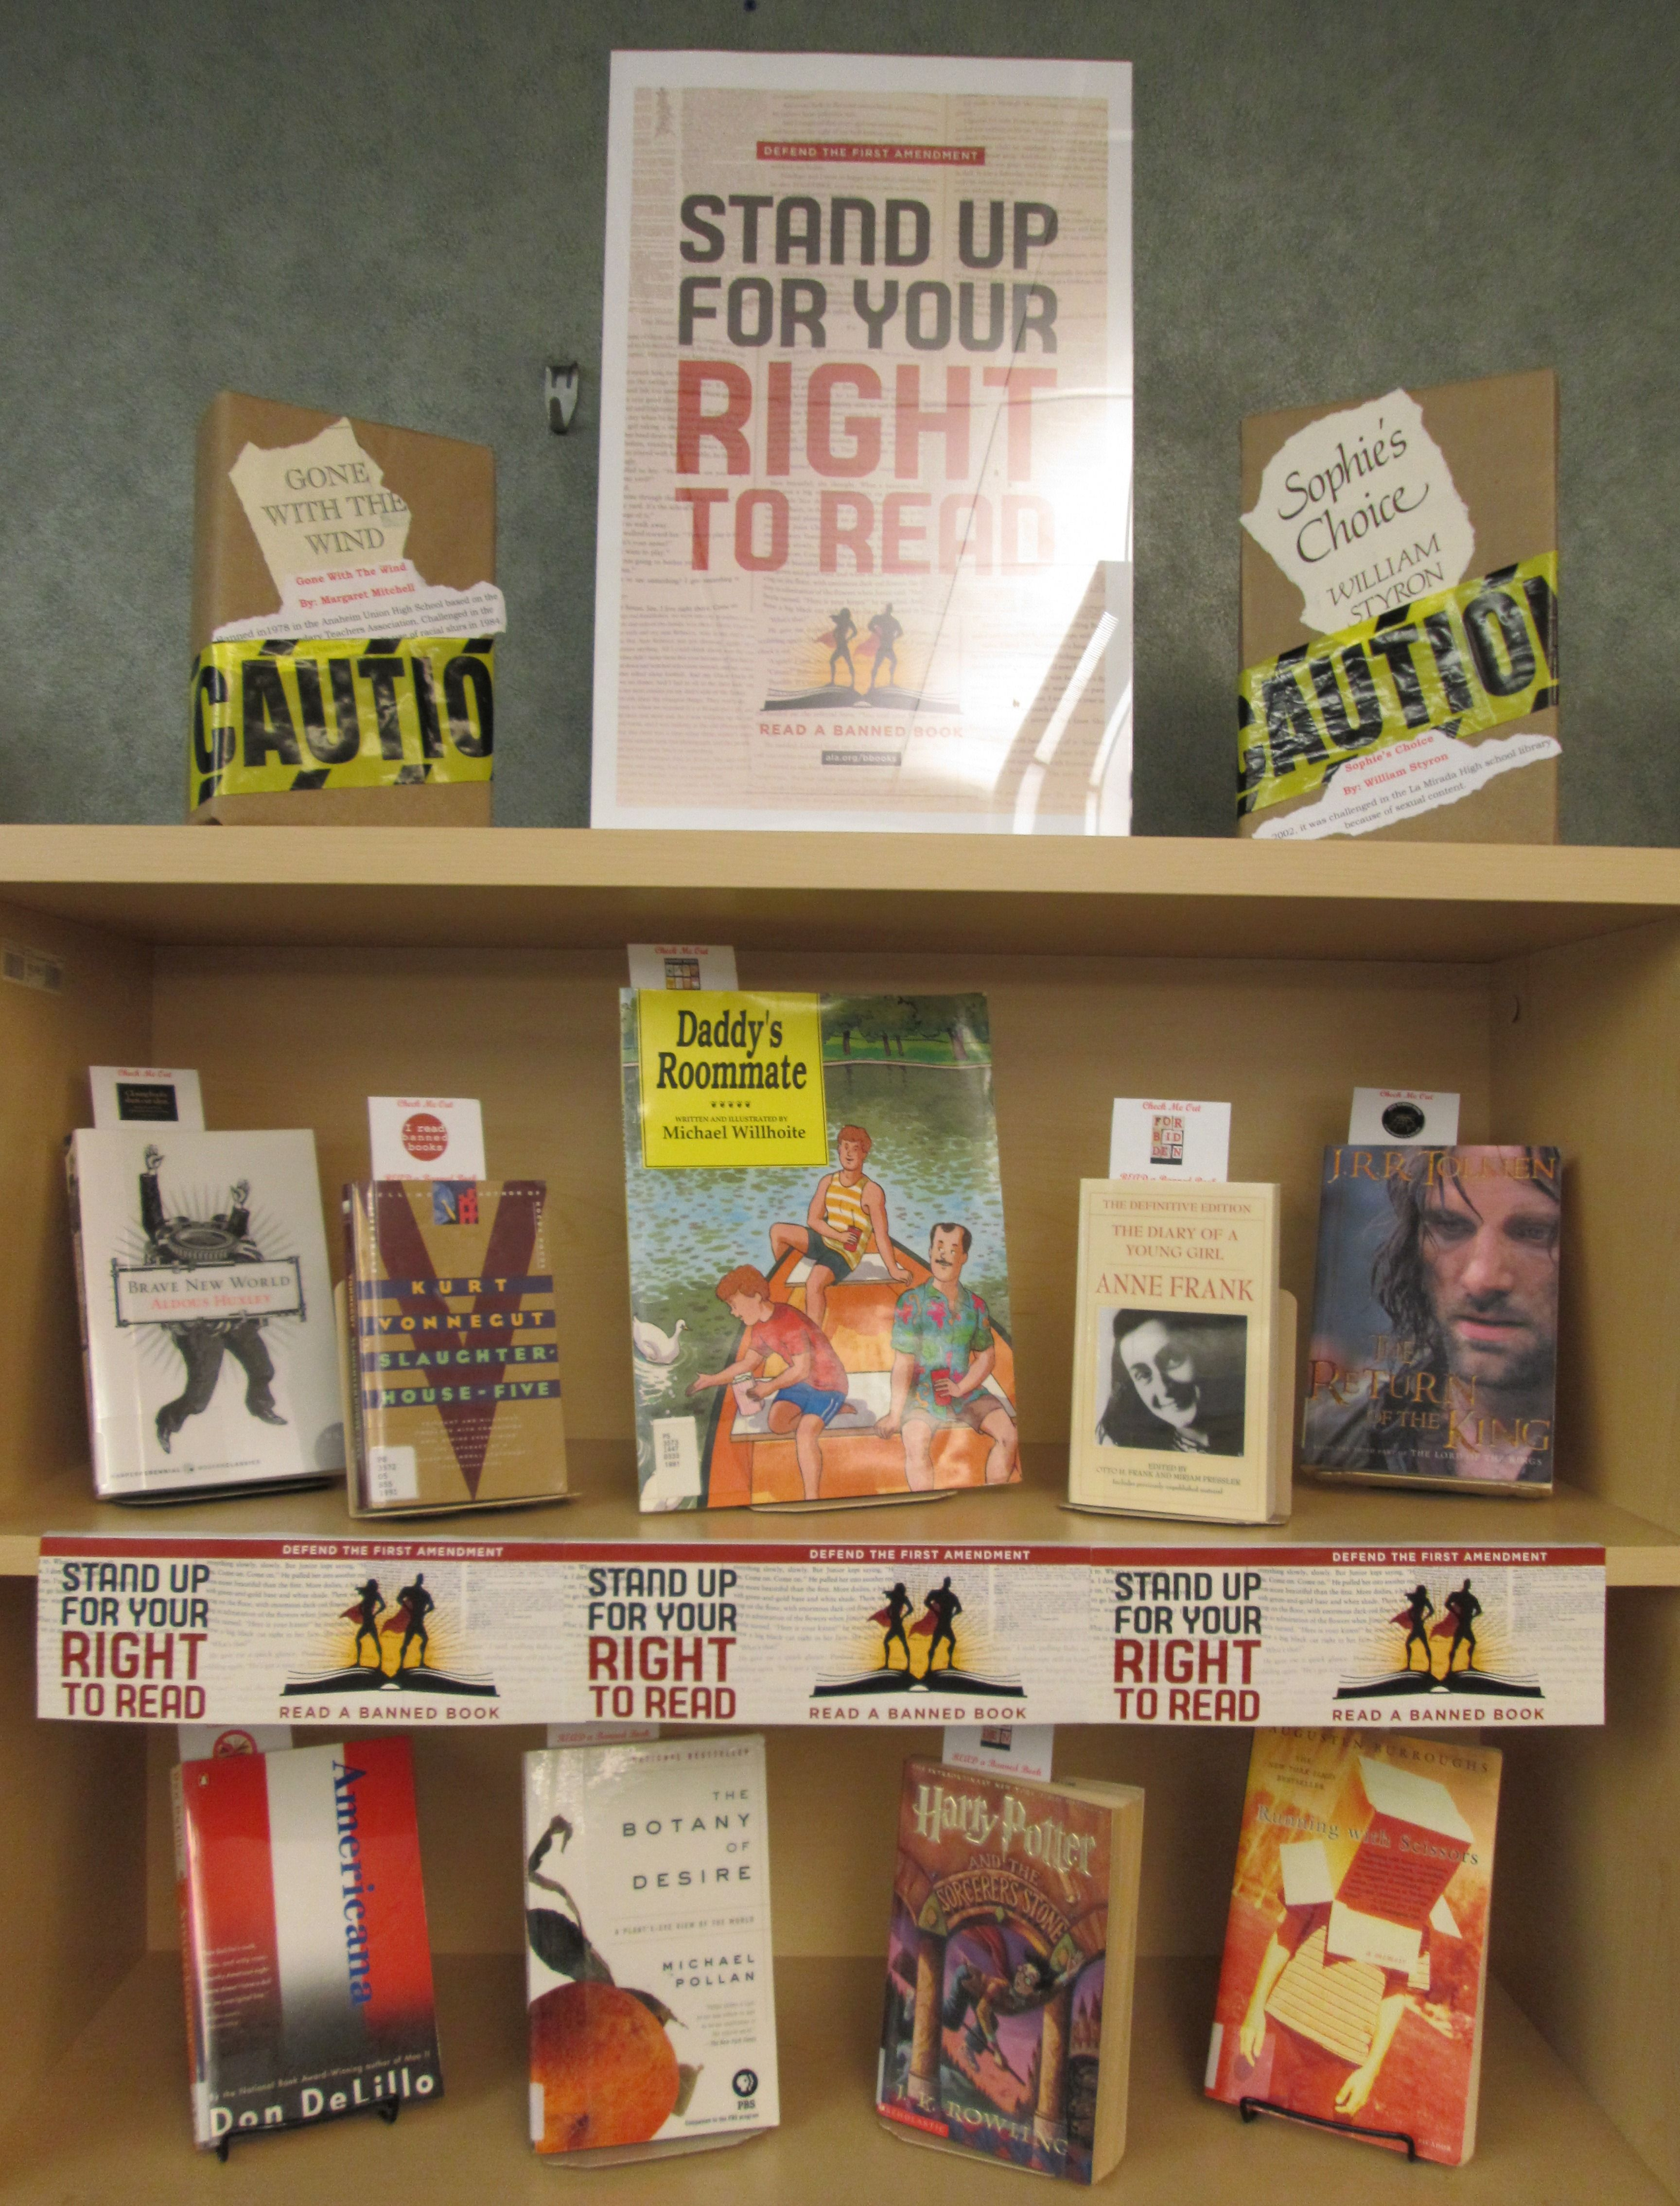 Banned Books Week September 2016 at Bellevue University Library.